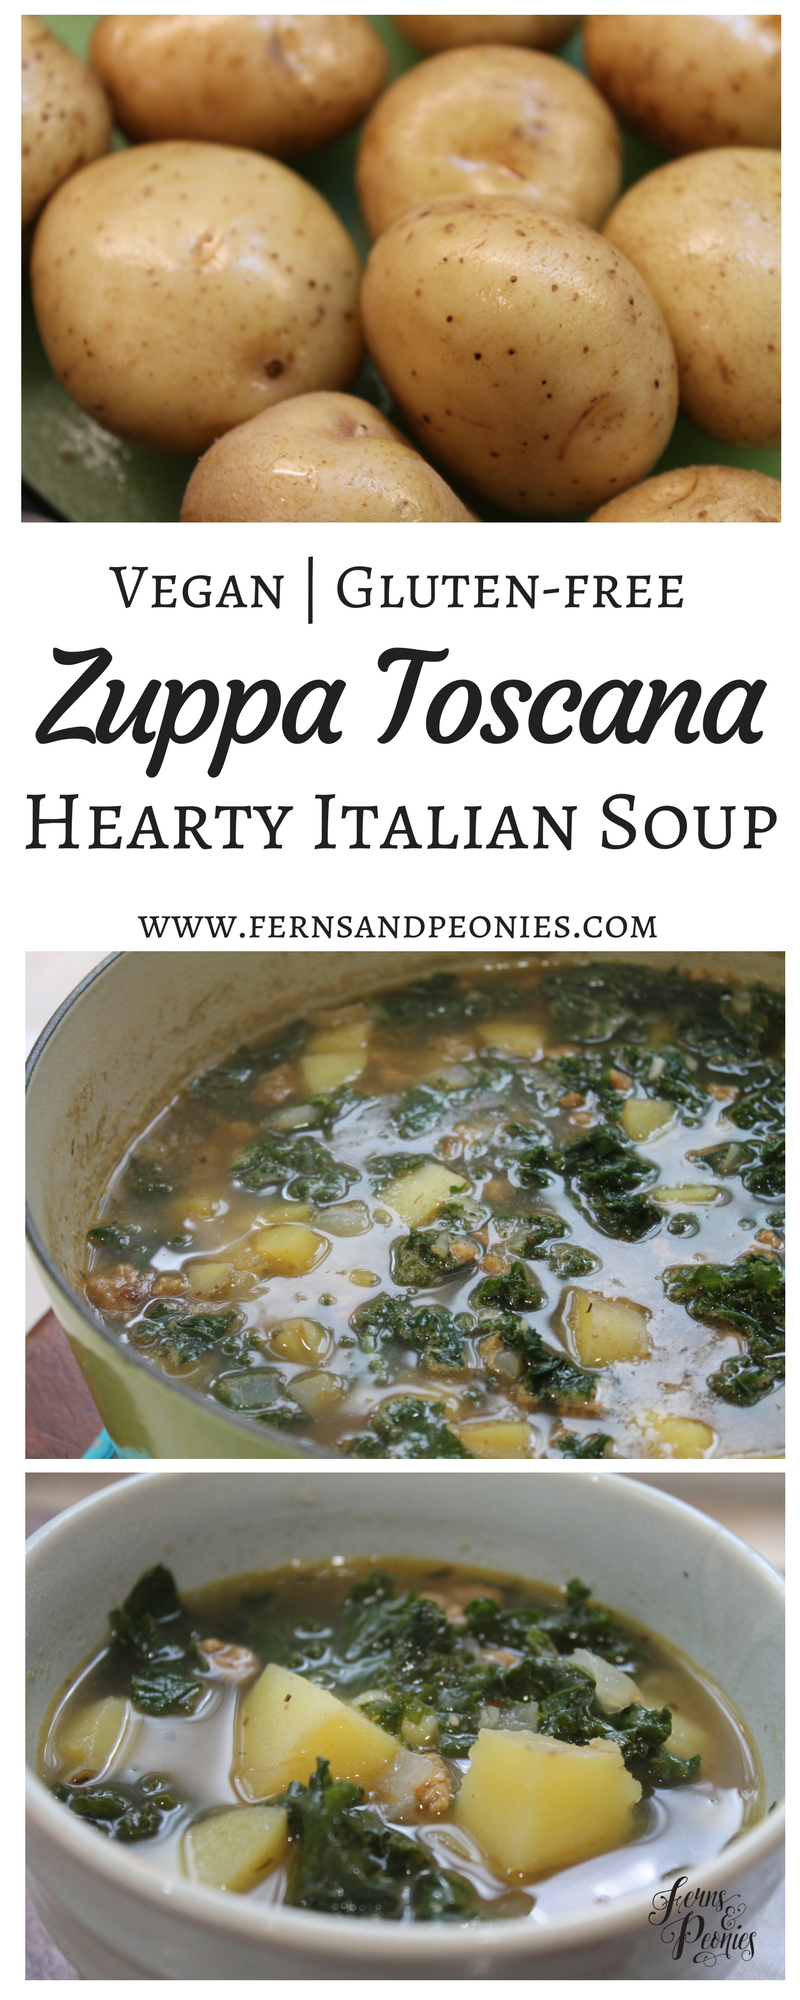 Vegan and Gluten-free Zuppa Toscana—Hearty Italian Soup by www.fernsandpeonies.com